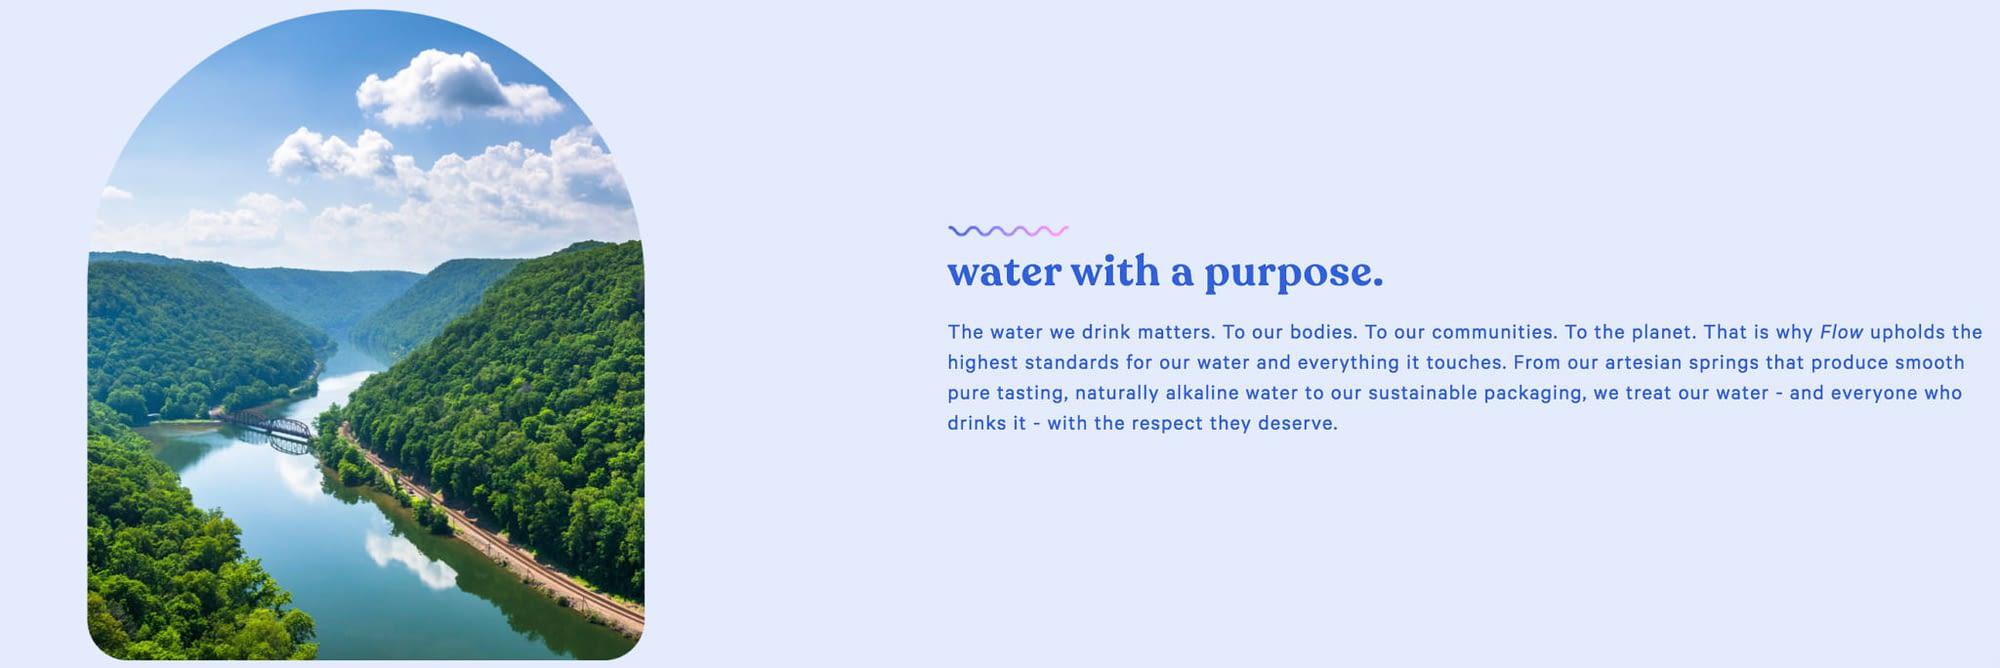 Flow brand purpose